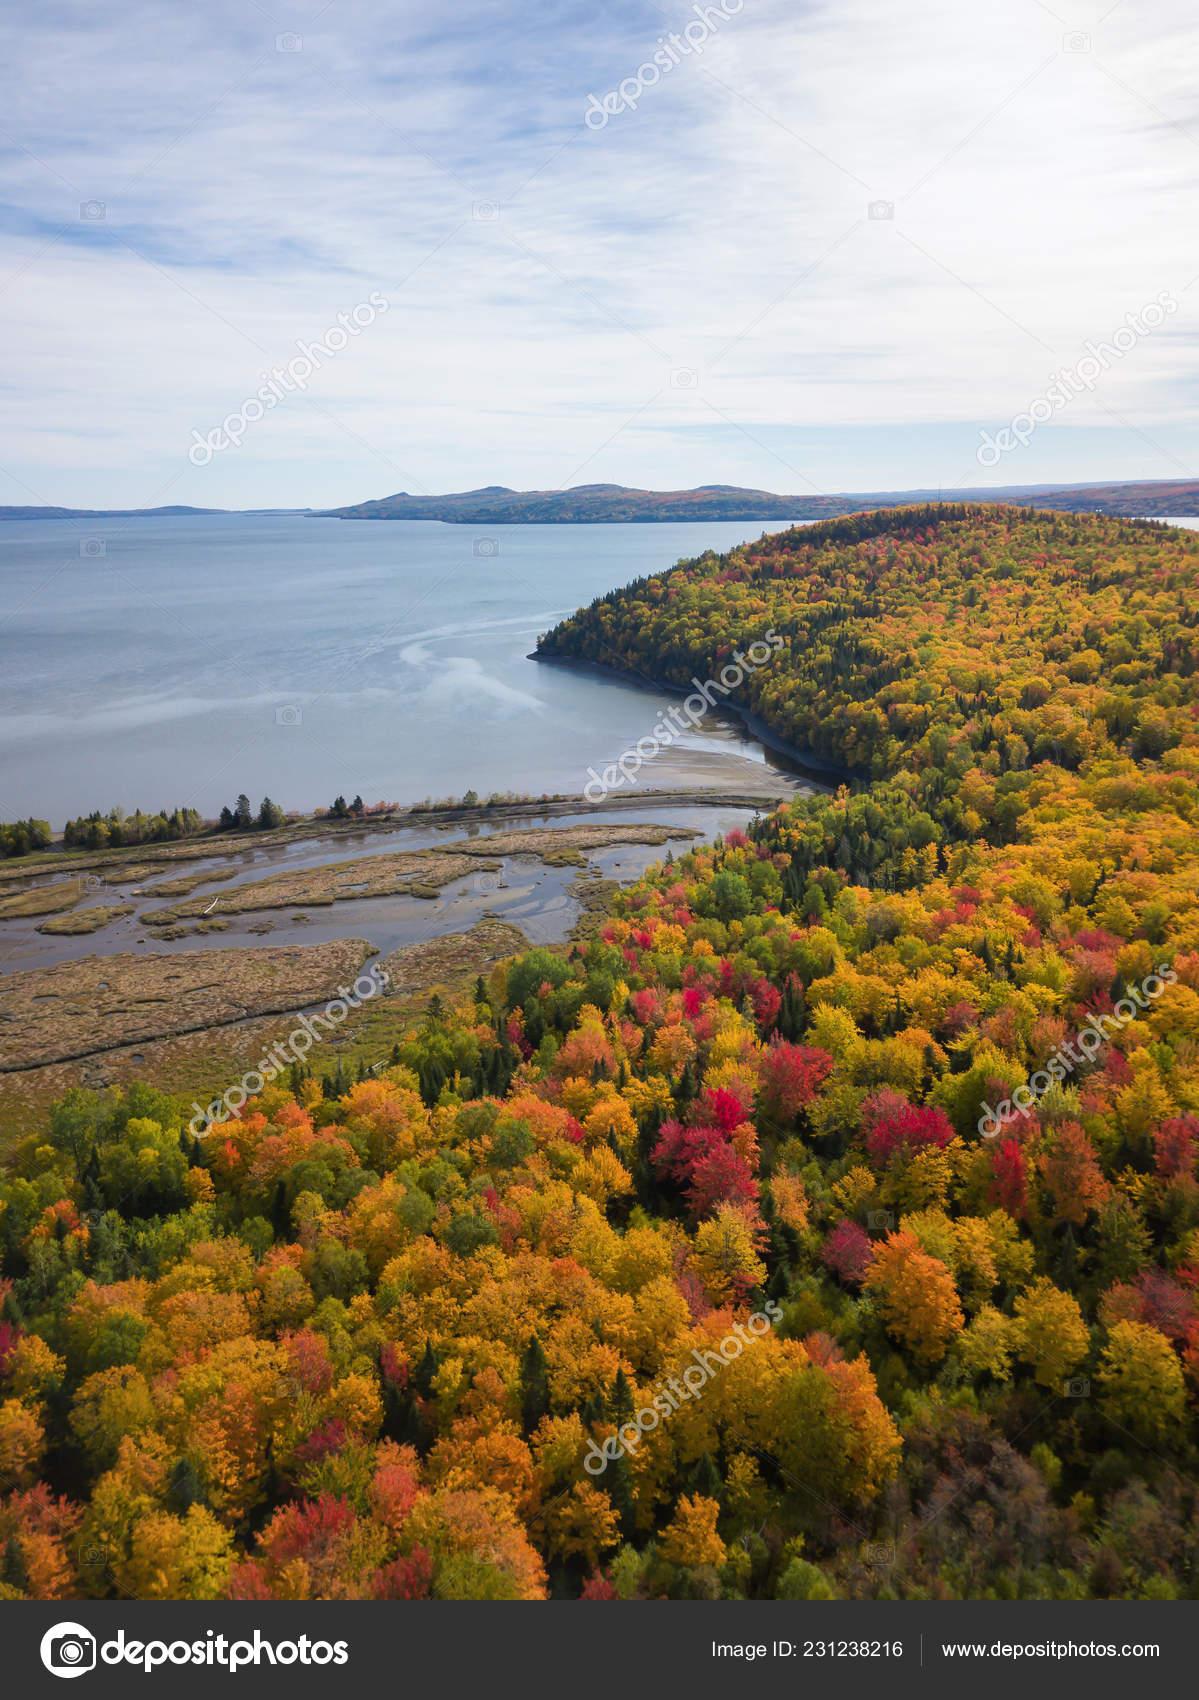 Aerial View Beautiful Canadian Landscape Fall Color Season Taken Pointe Stock Photo C Edb3 16 231238216